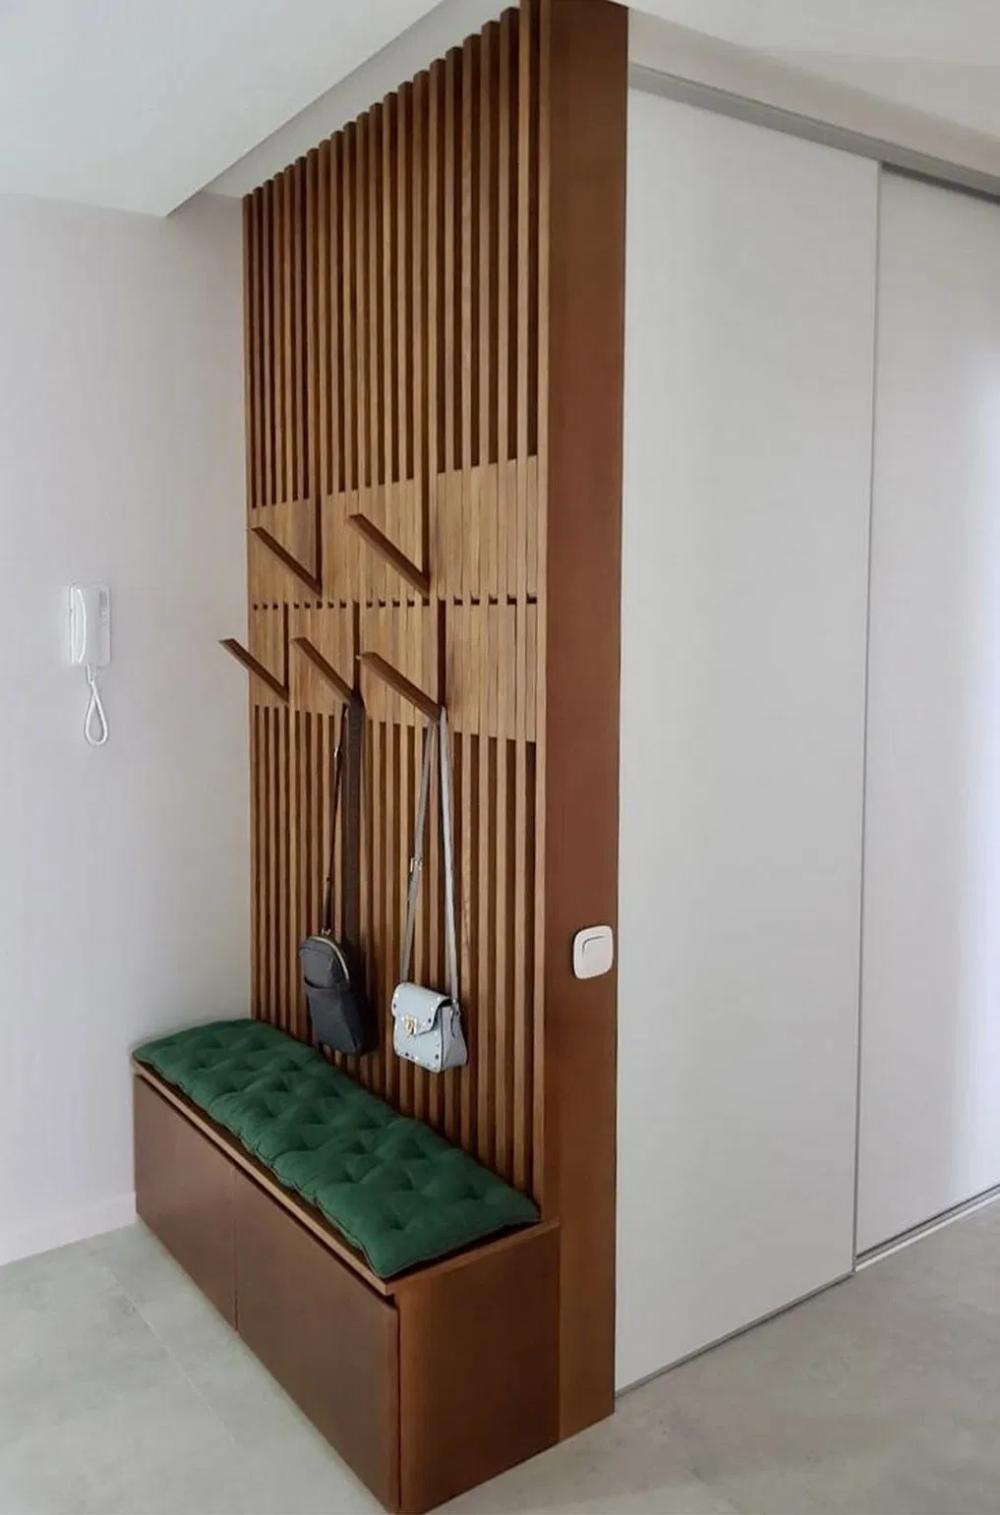 30 Creative Diy Woodworking Plans For Build Home Furniture De